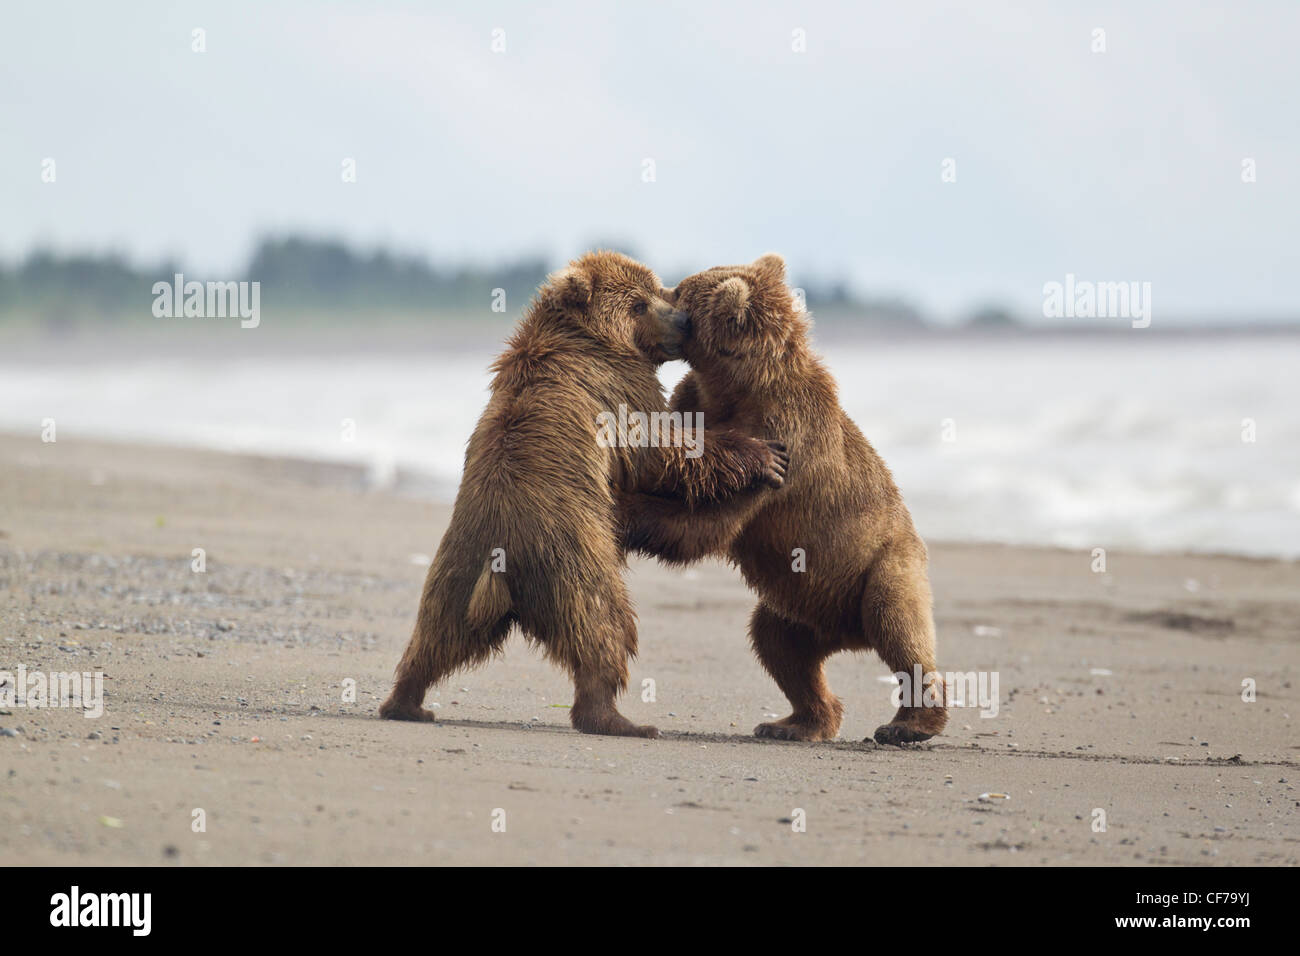 Alaskan brown bears fighting on a beach in Lake Clark National Park - Stock Image